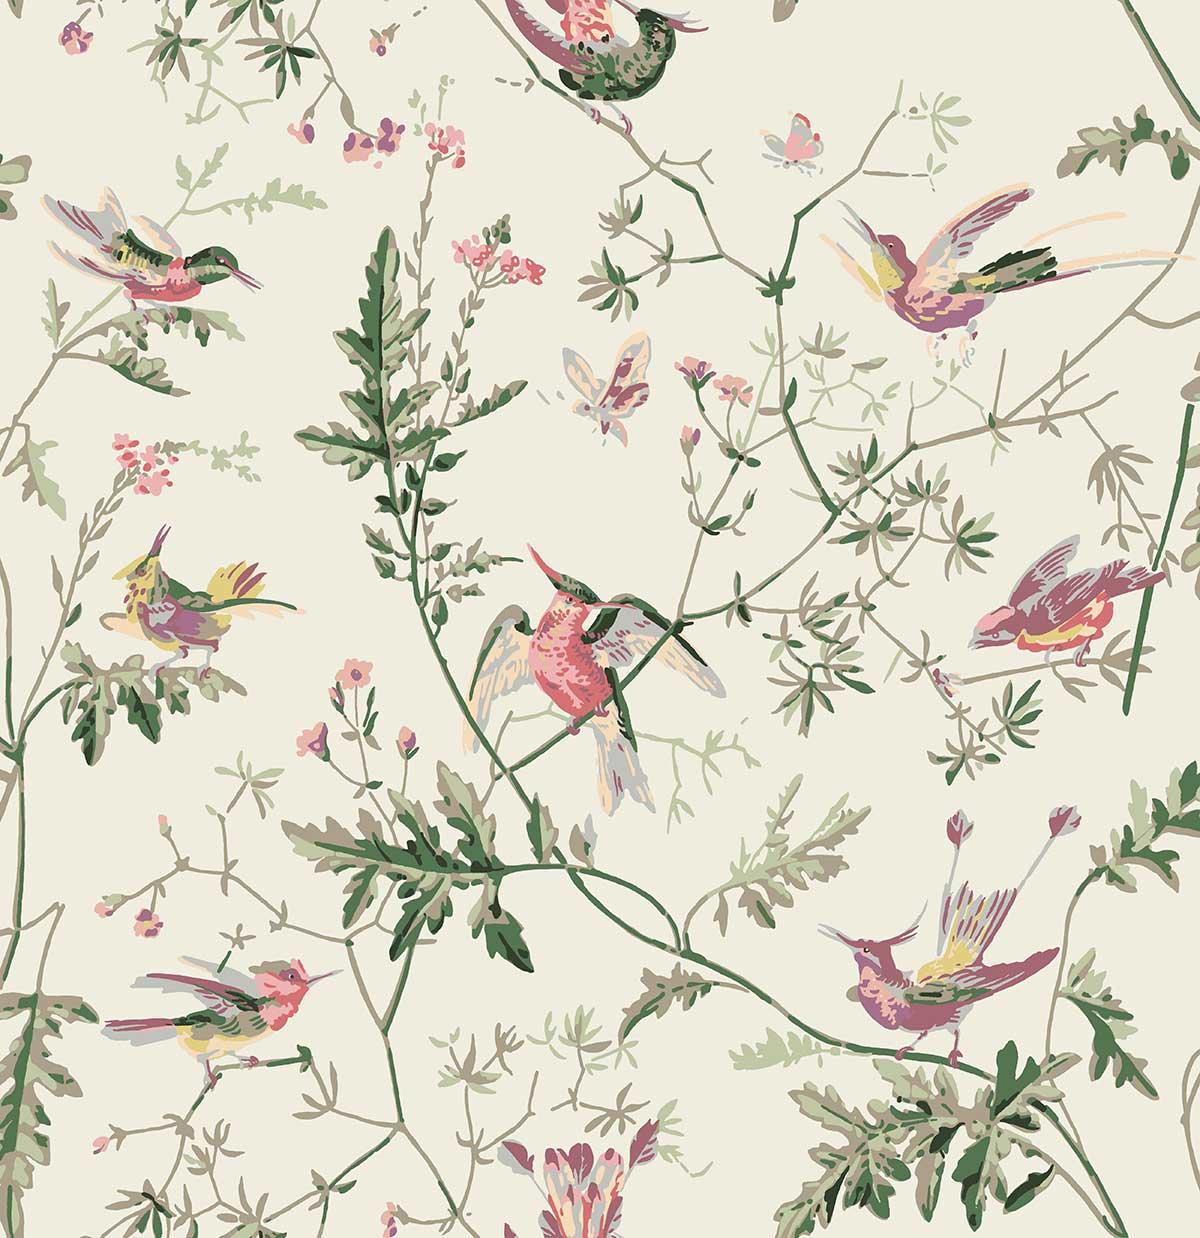 Cole & Son Hummingbirds Classic Multi Fabric - Product code: F62/1001